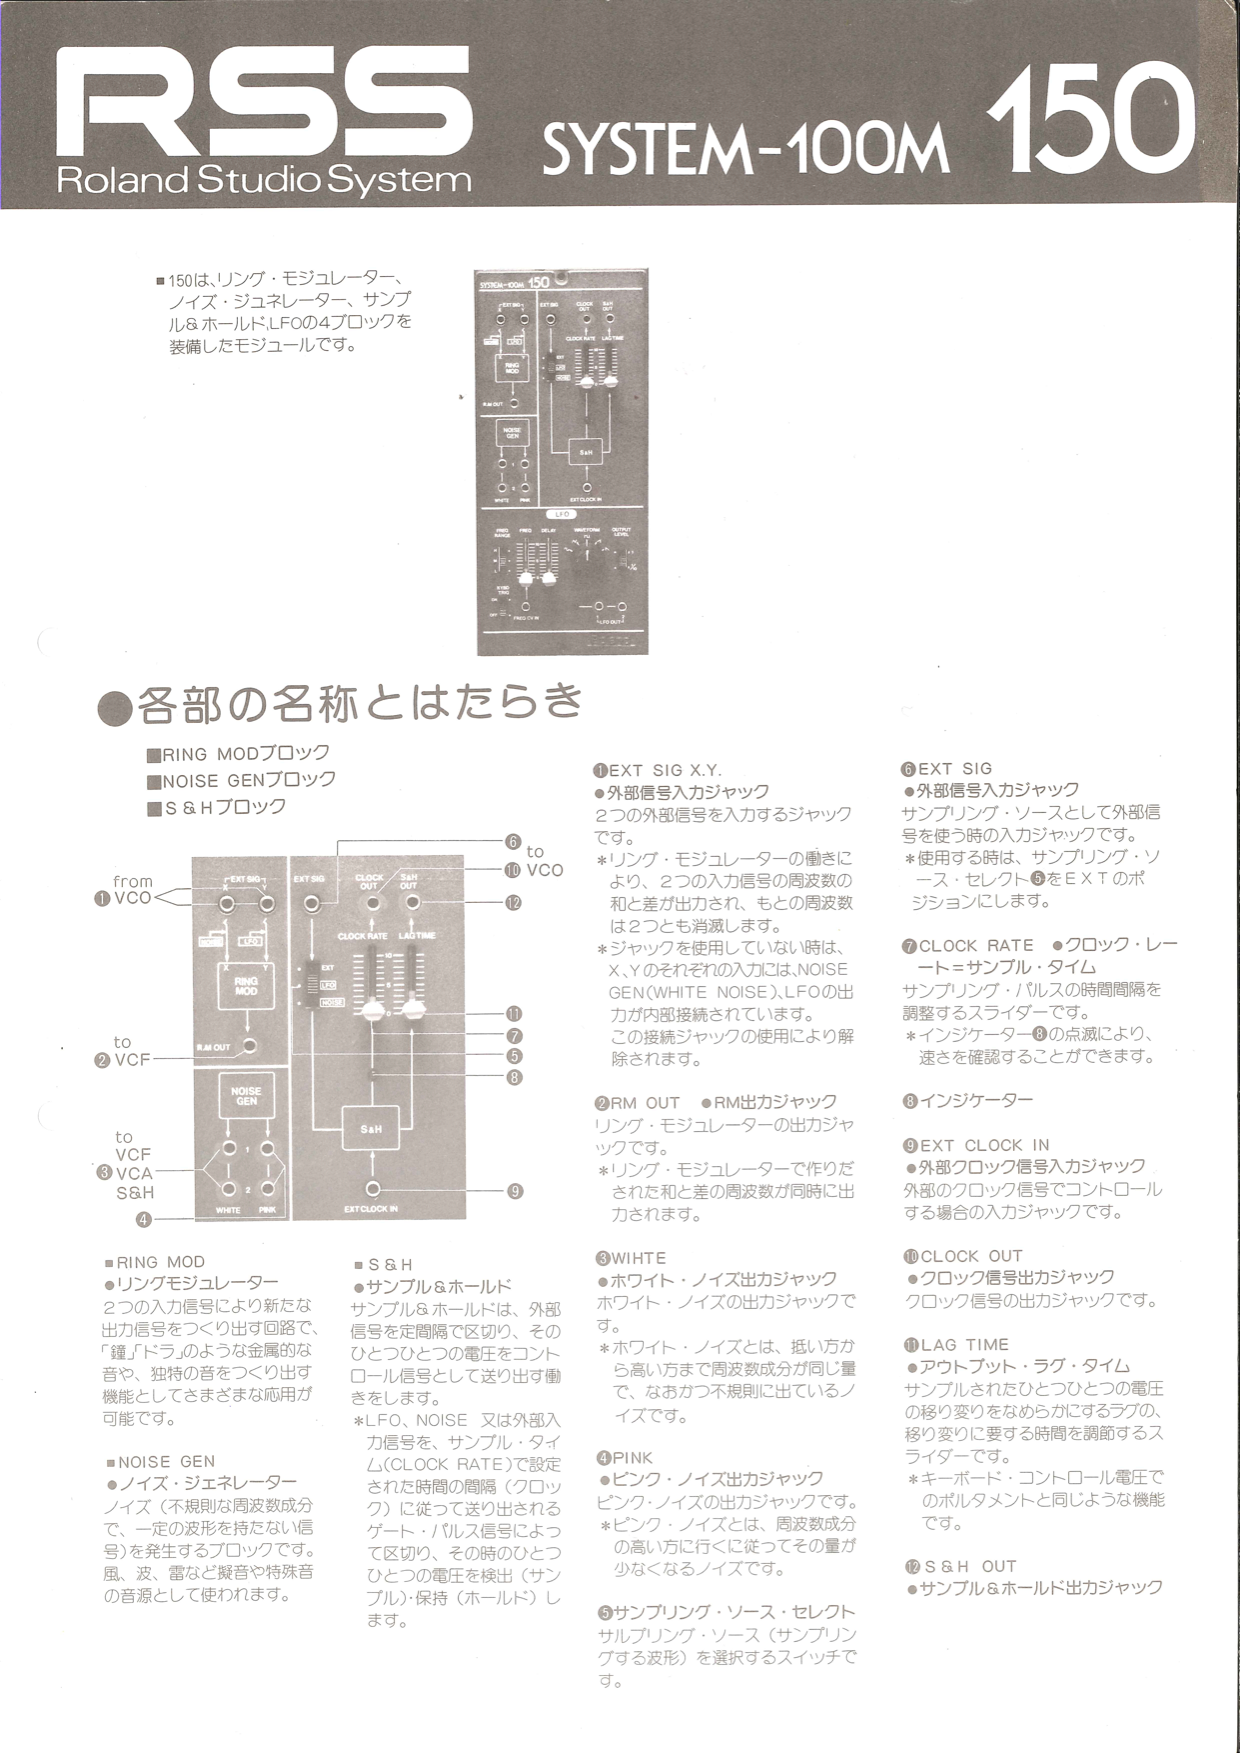 System 100m module 150